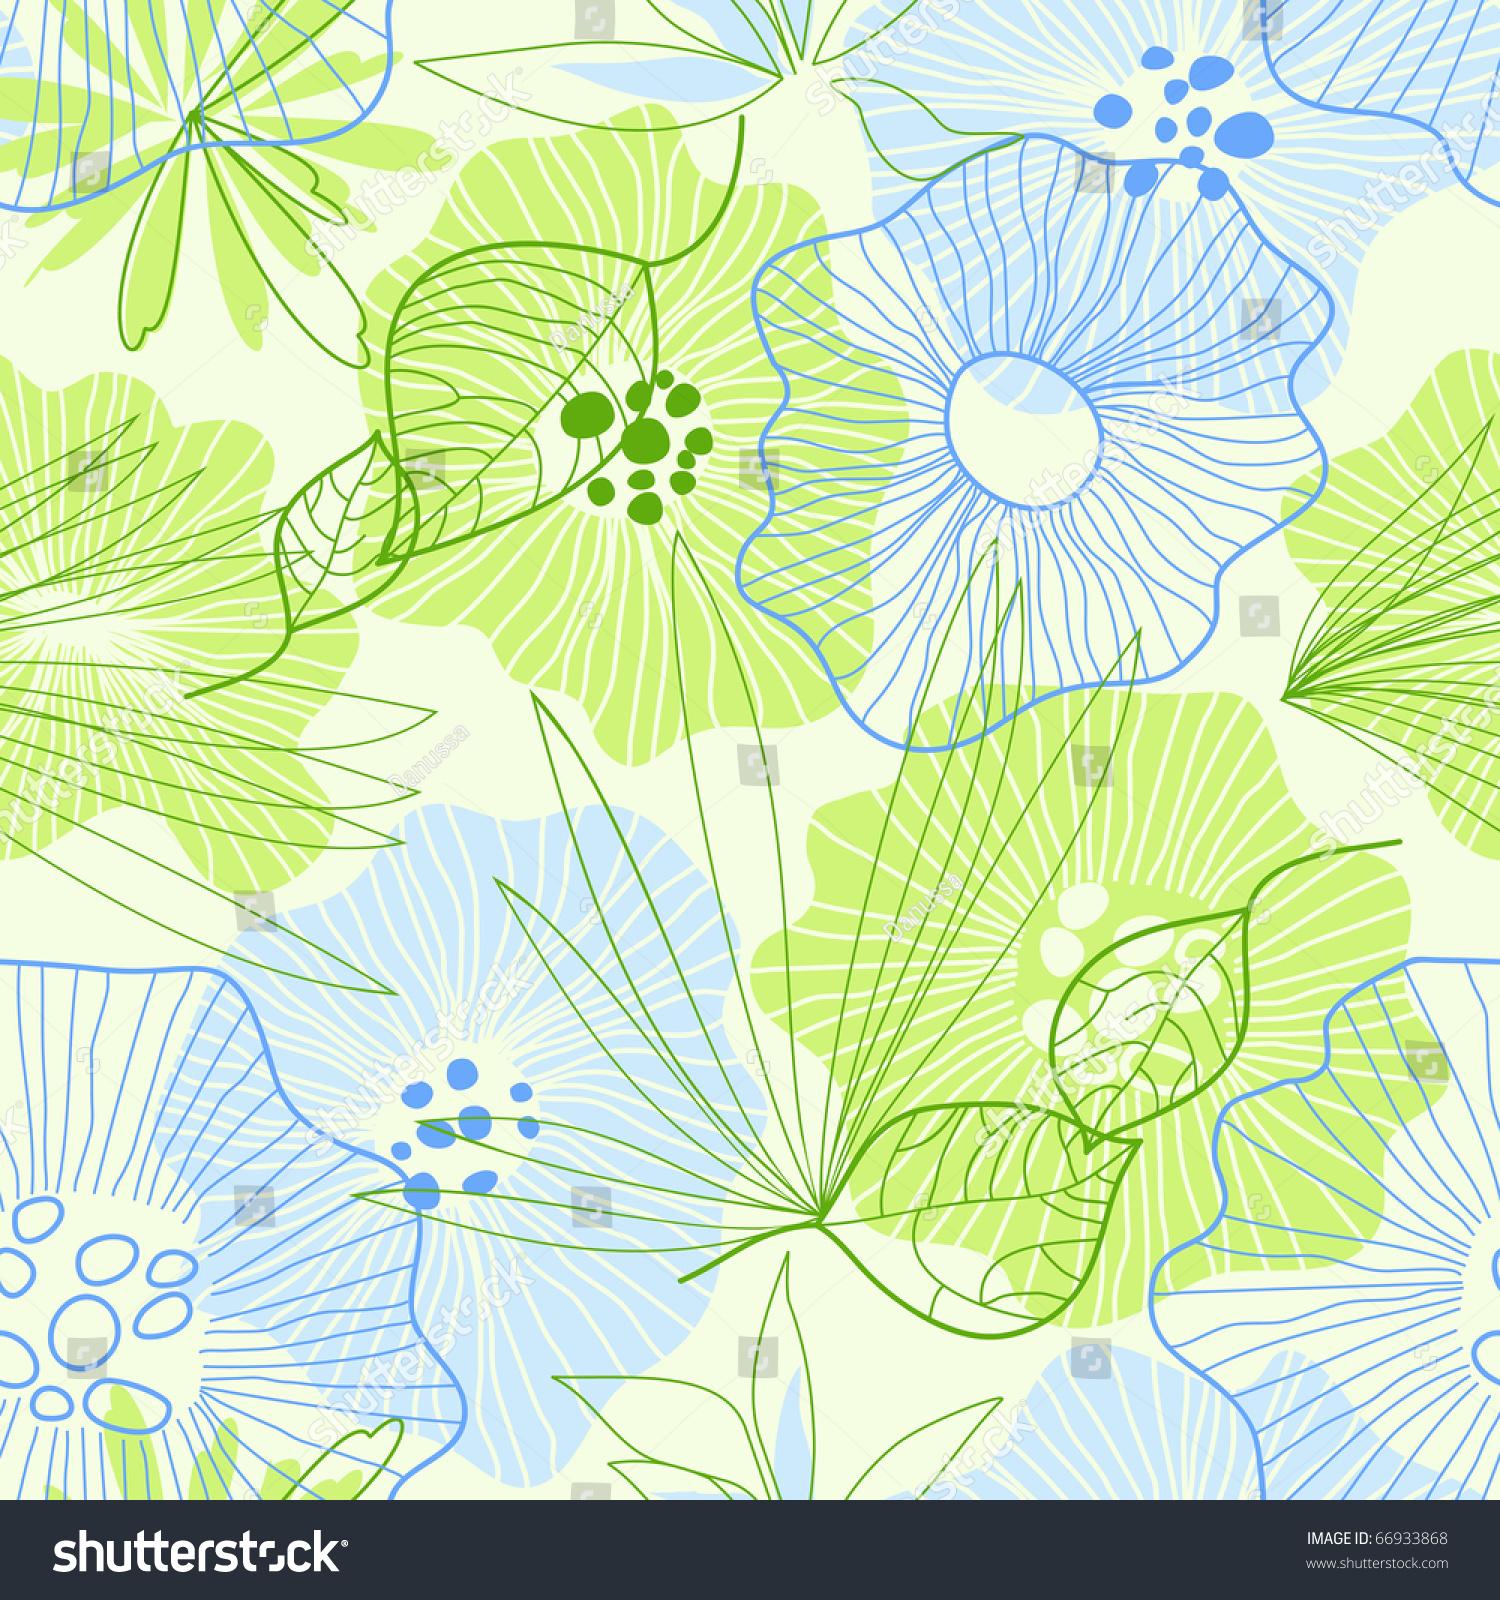 whimsical floral background stock vector illustration